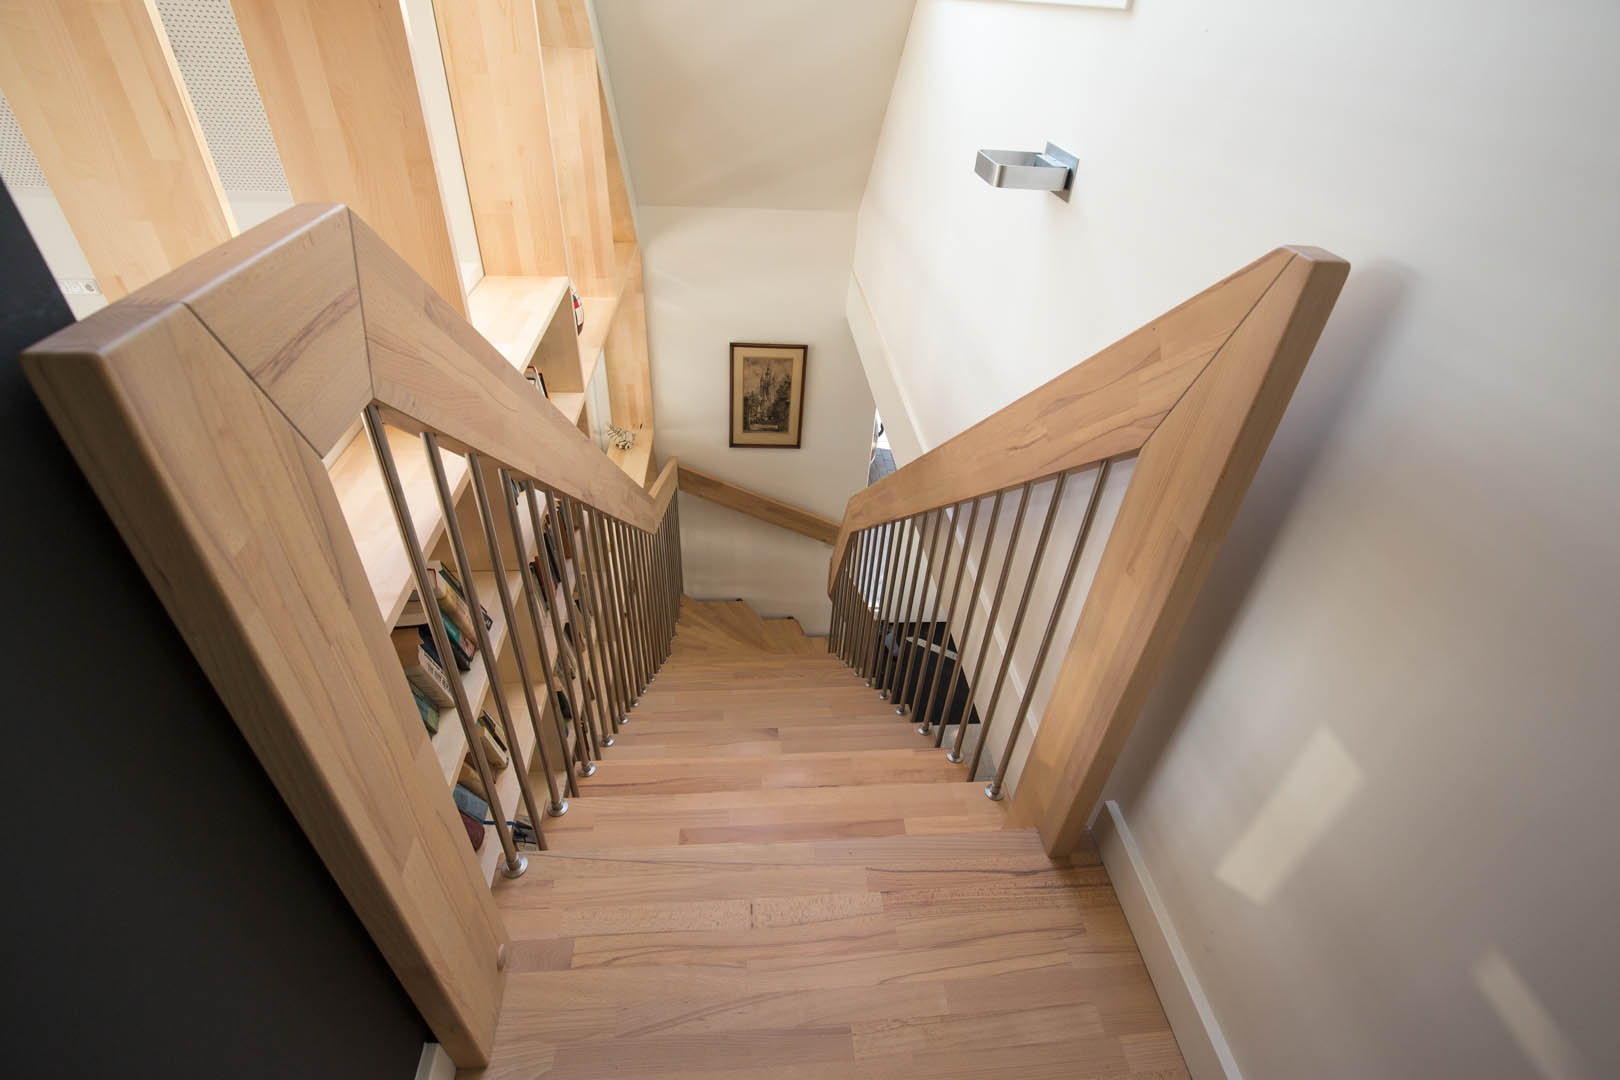 Semi zwevende bont beuken trappen met eindbordes 05